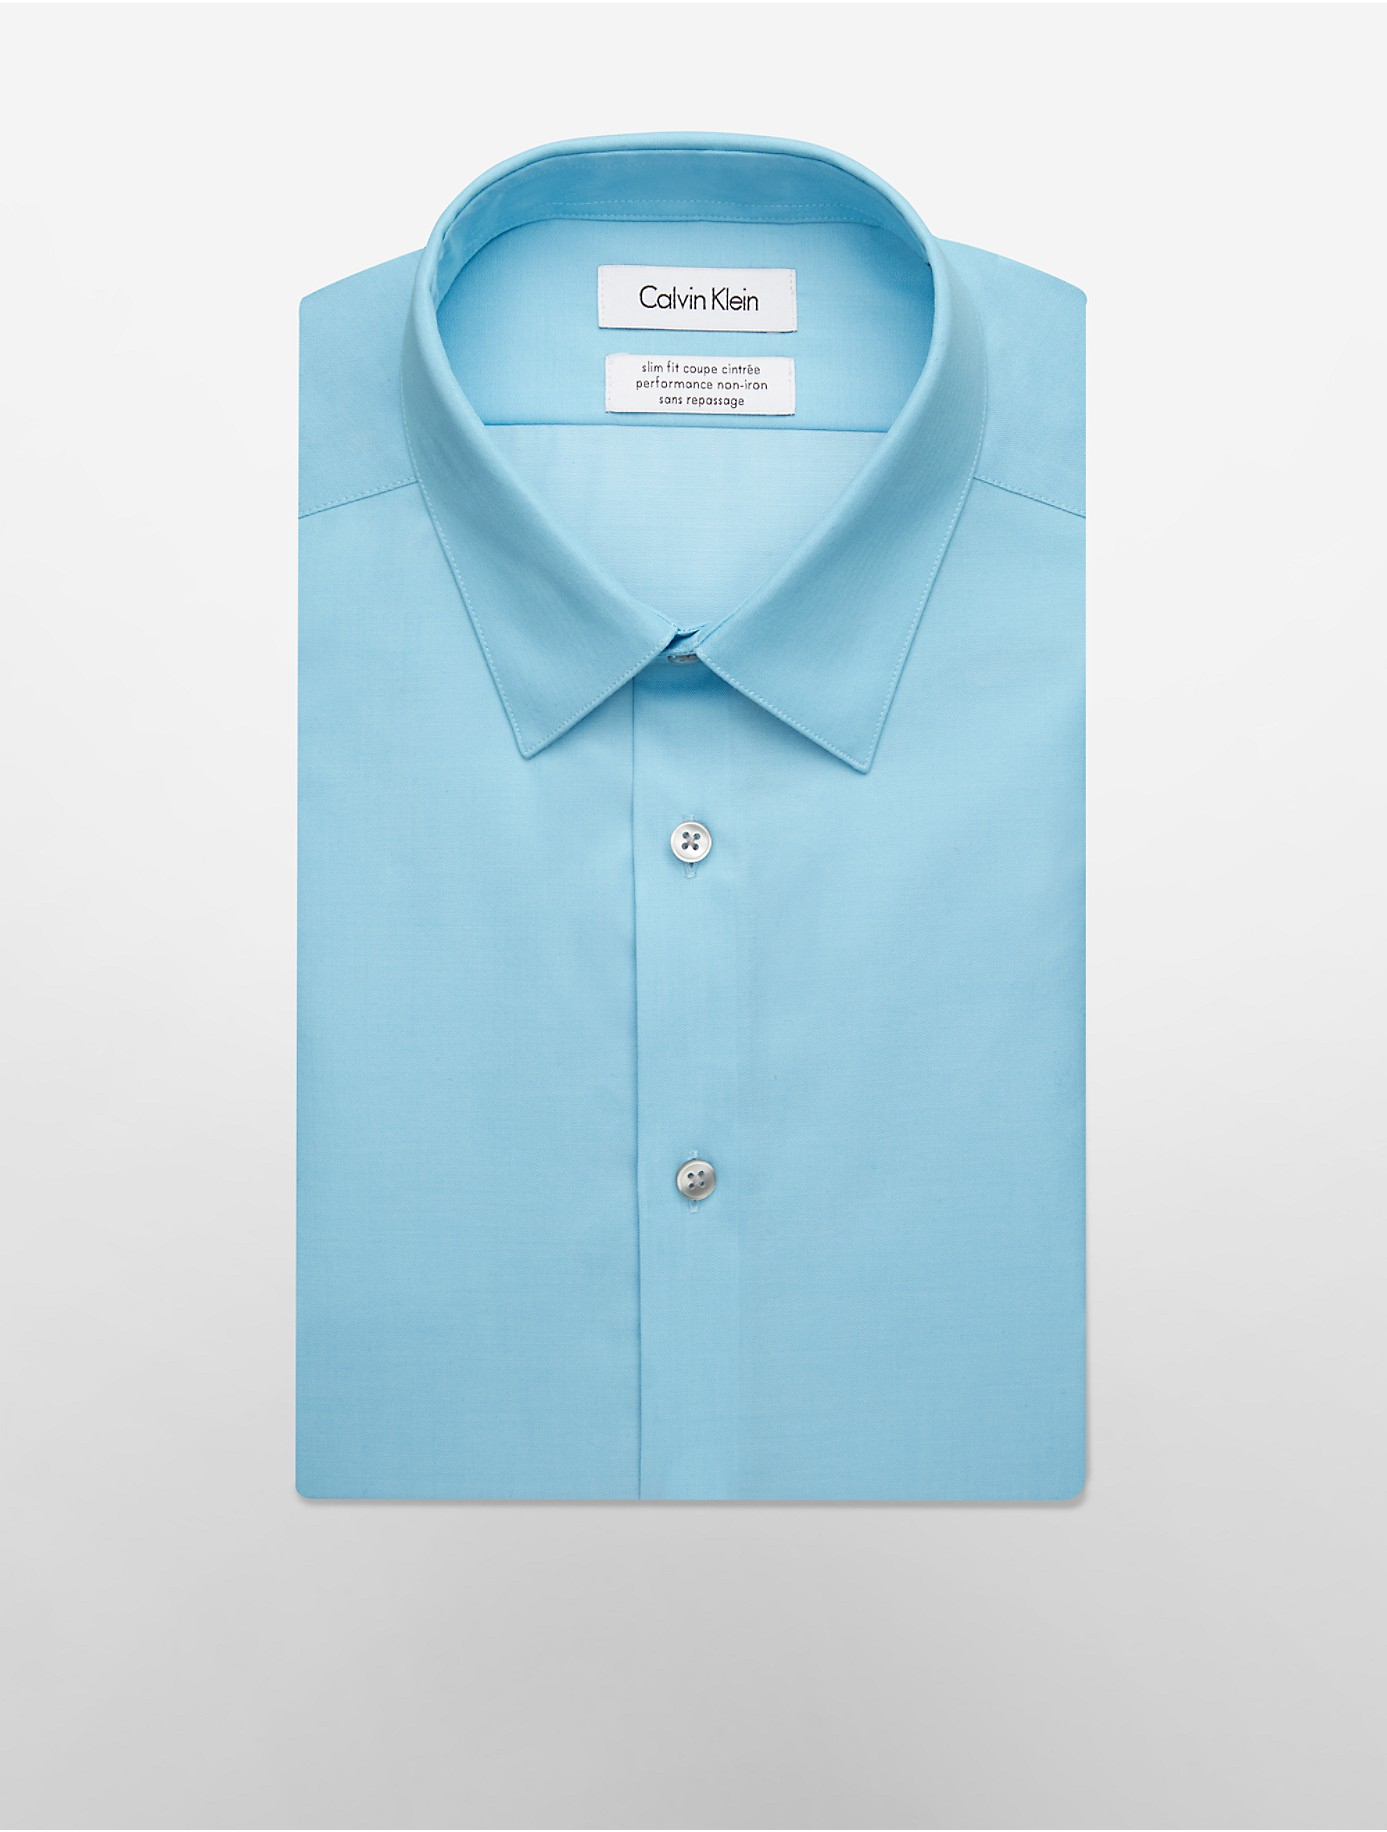 Lyst calvin klein white label steel slim fit non iron for White herringbone dress shirt